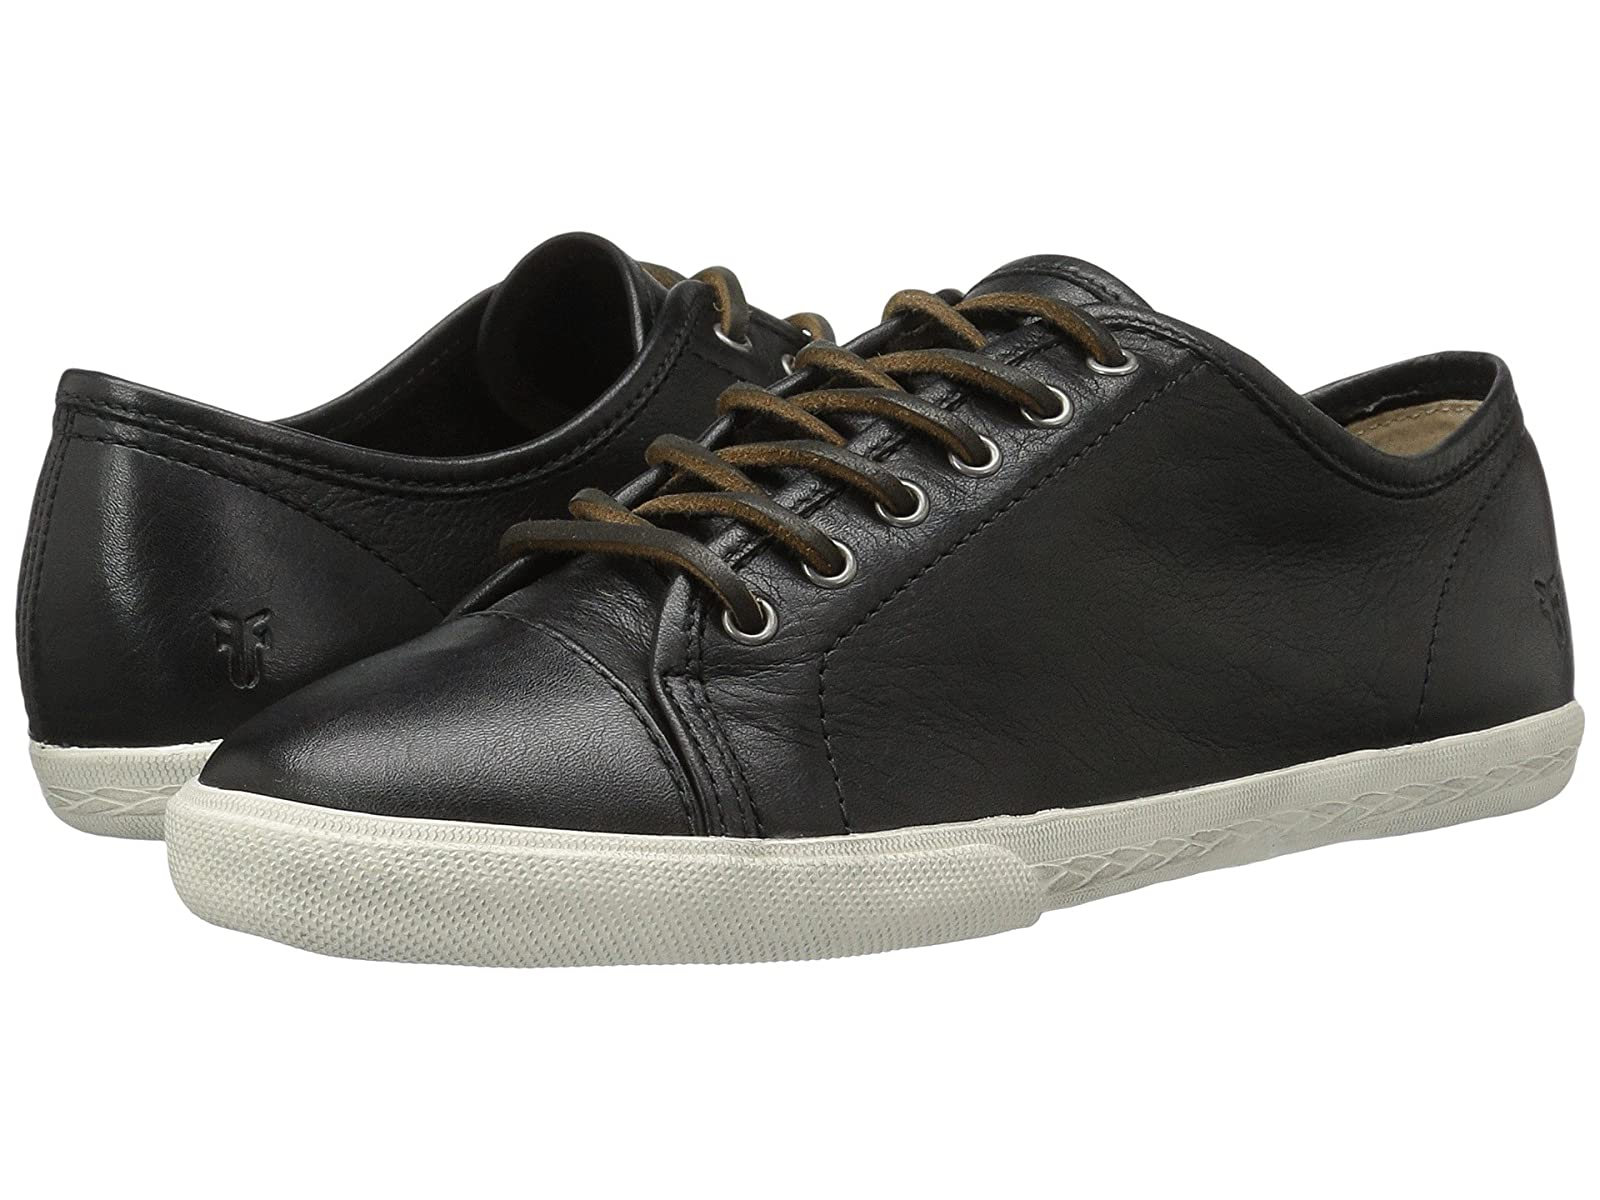 Frye Mindy LowCheap and distinctive eye-catching shoes